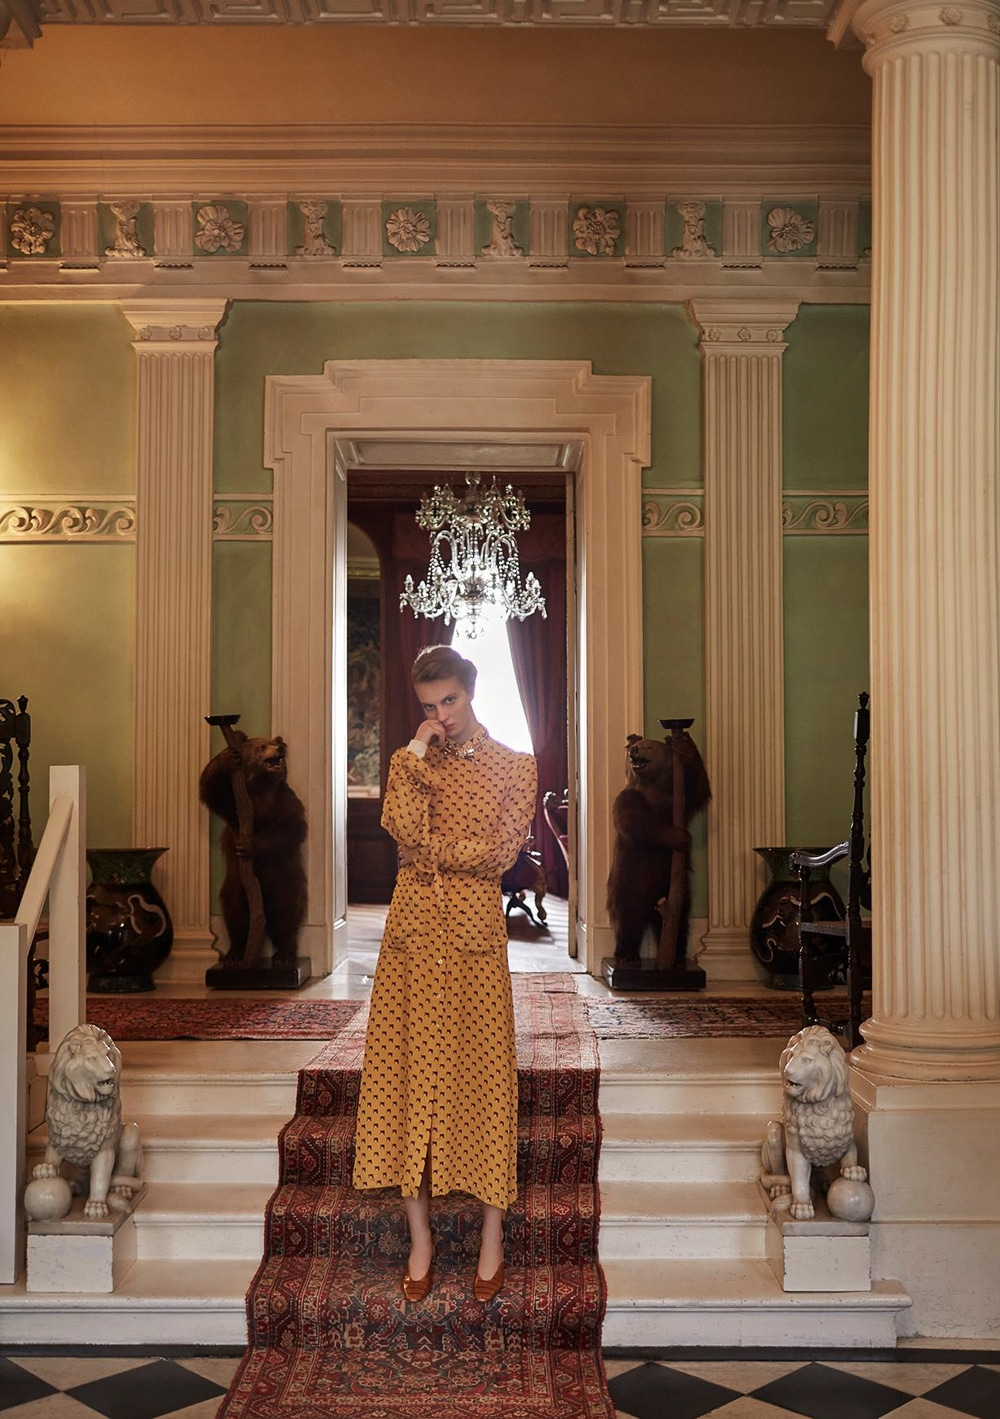 Harpers-Bazaar-UK-Septamber-2018-Florence-Kosky-Agata-Pospieszynska-9.jpg